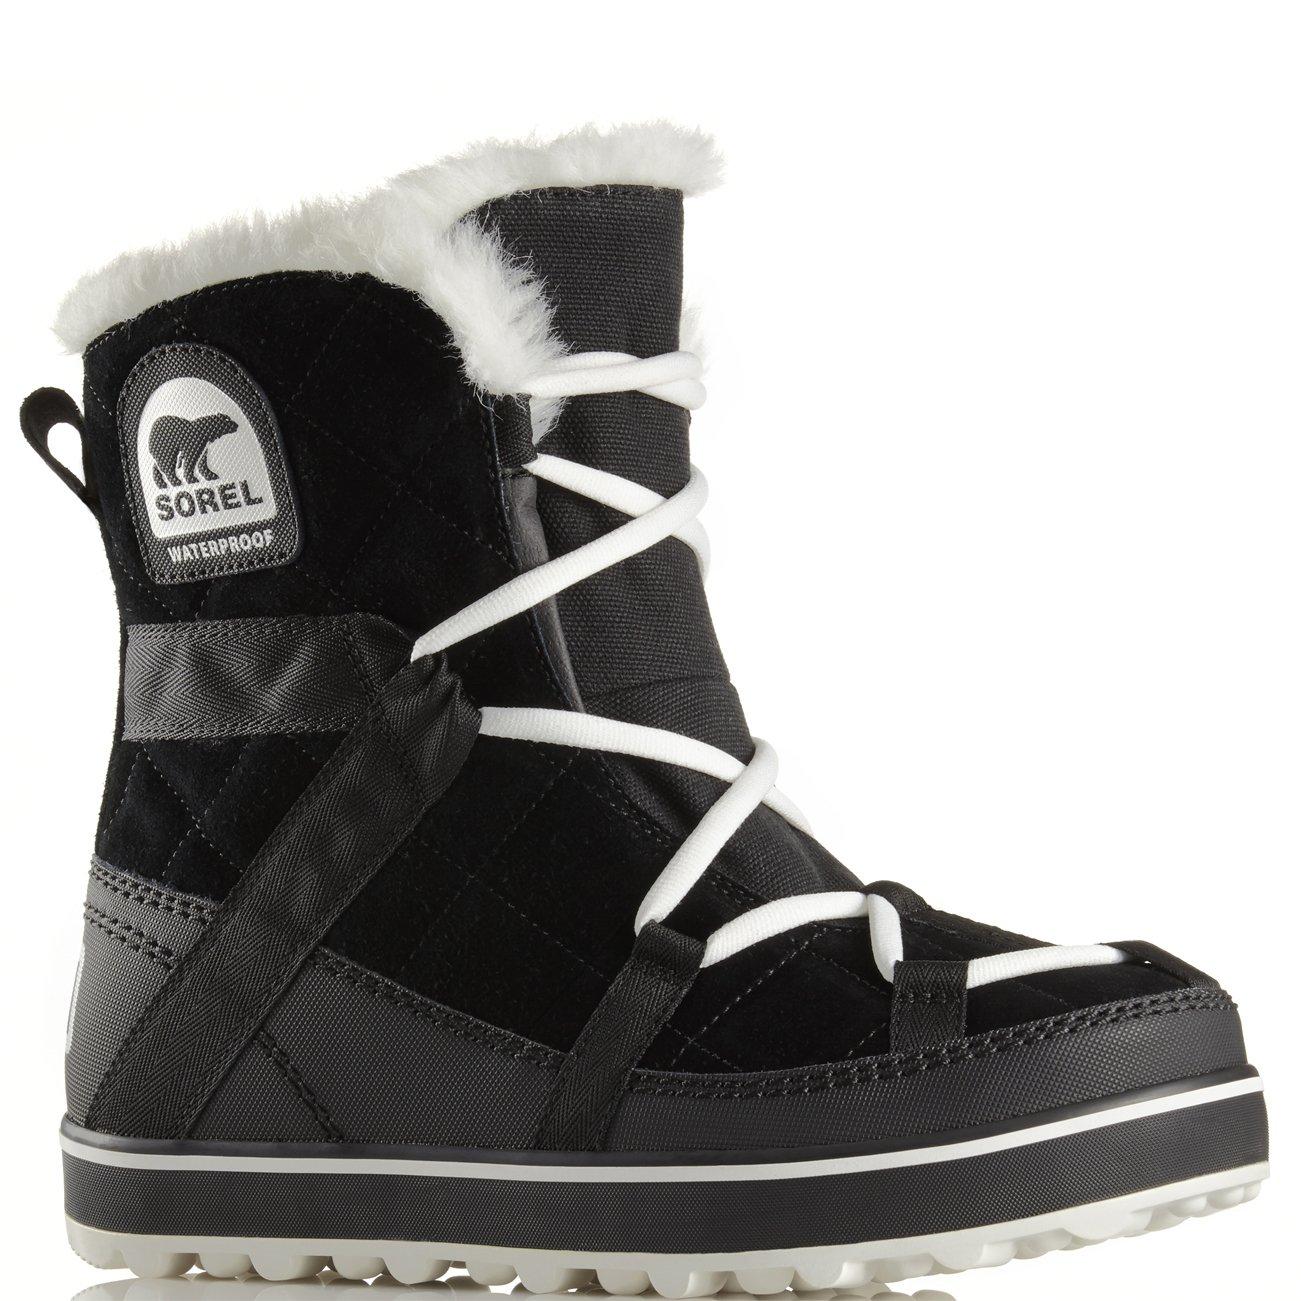 Womens Sorel Glacy Explorer Shortie Waterproof Snow Hiking Winter Boots - Black - 8